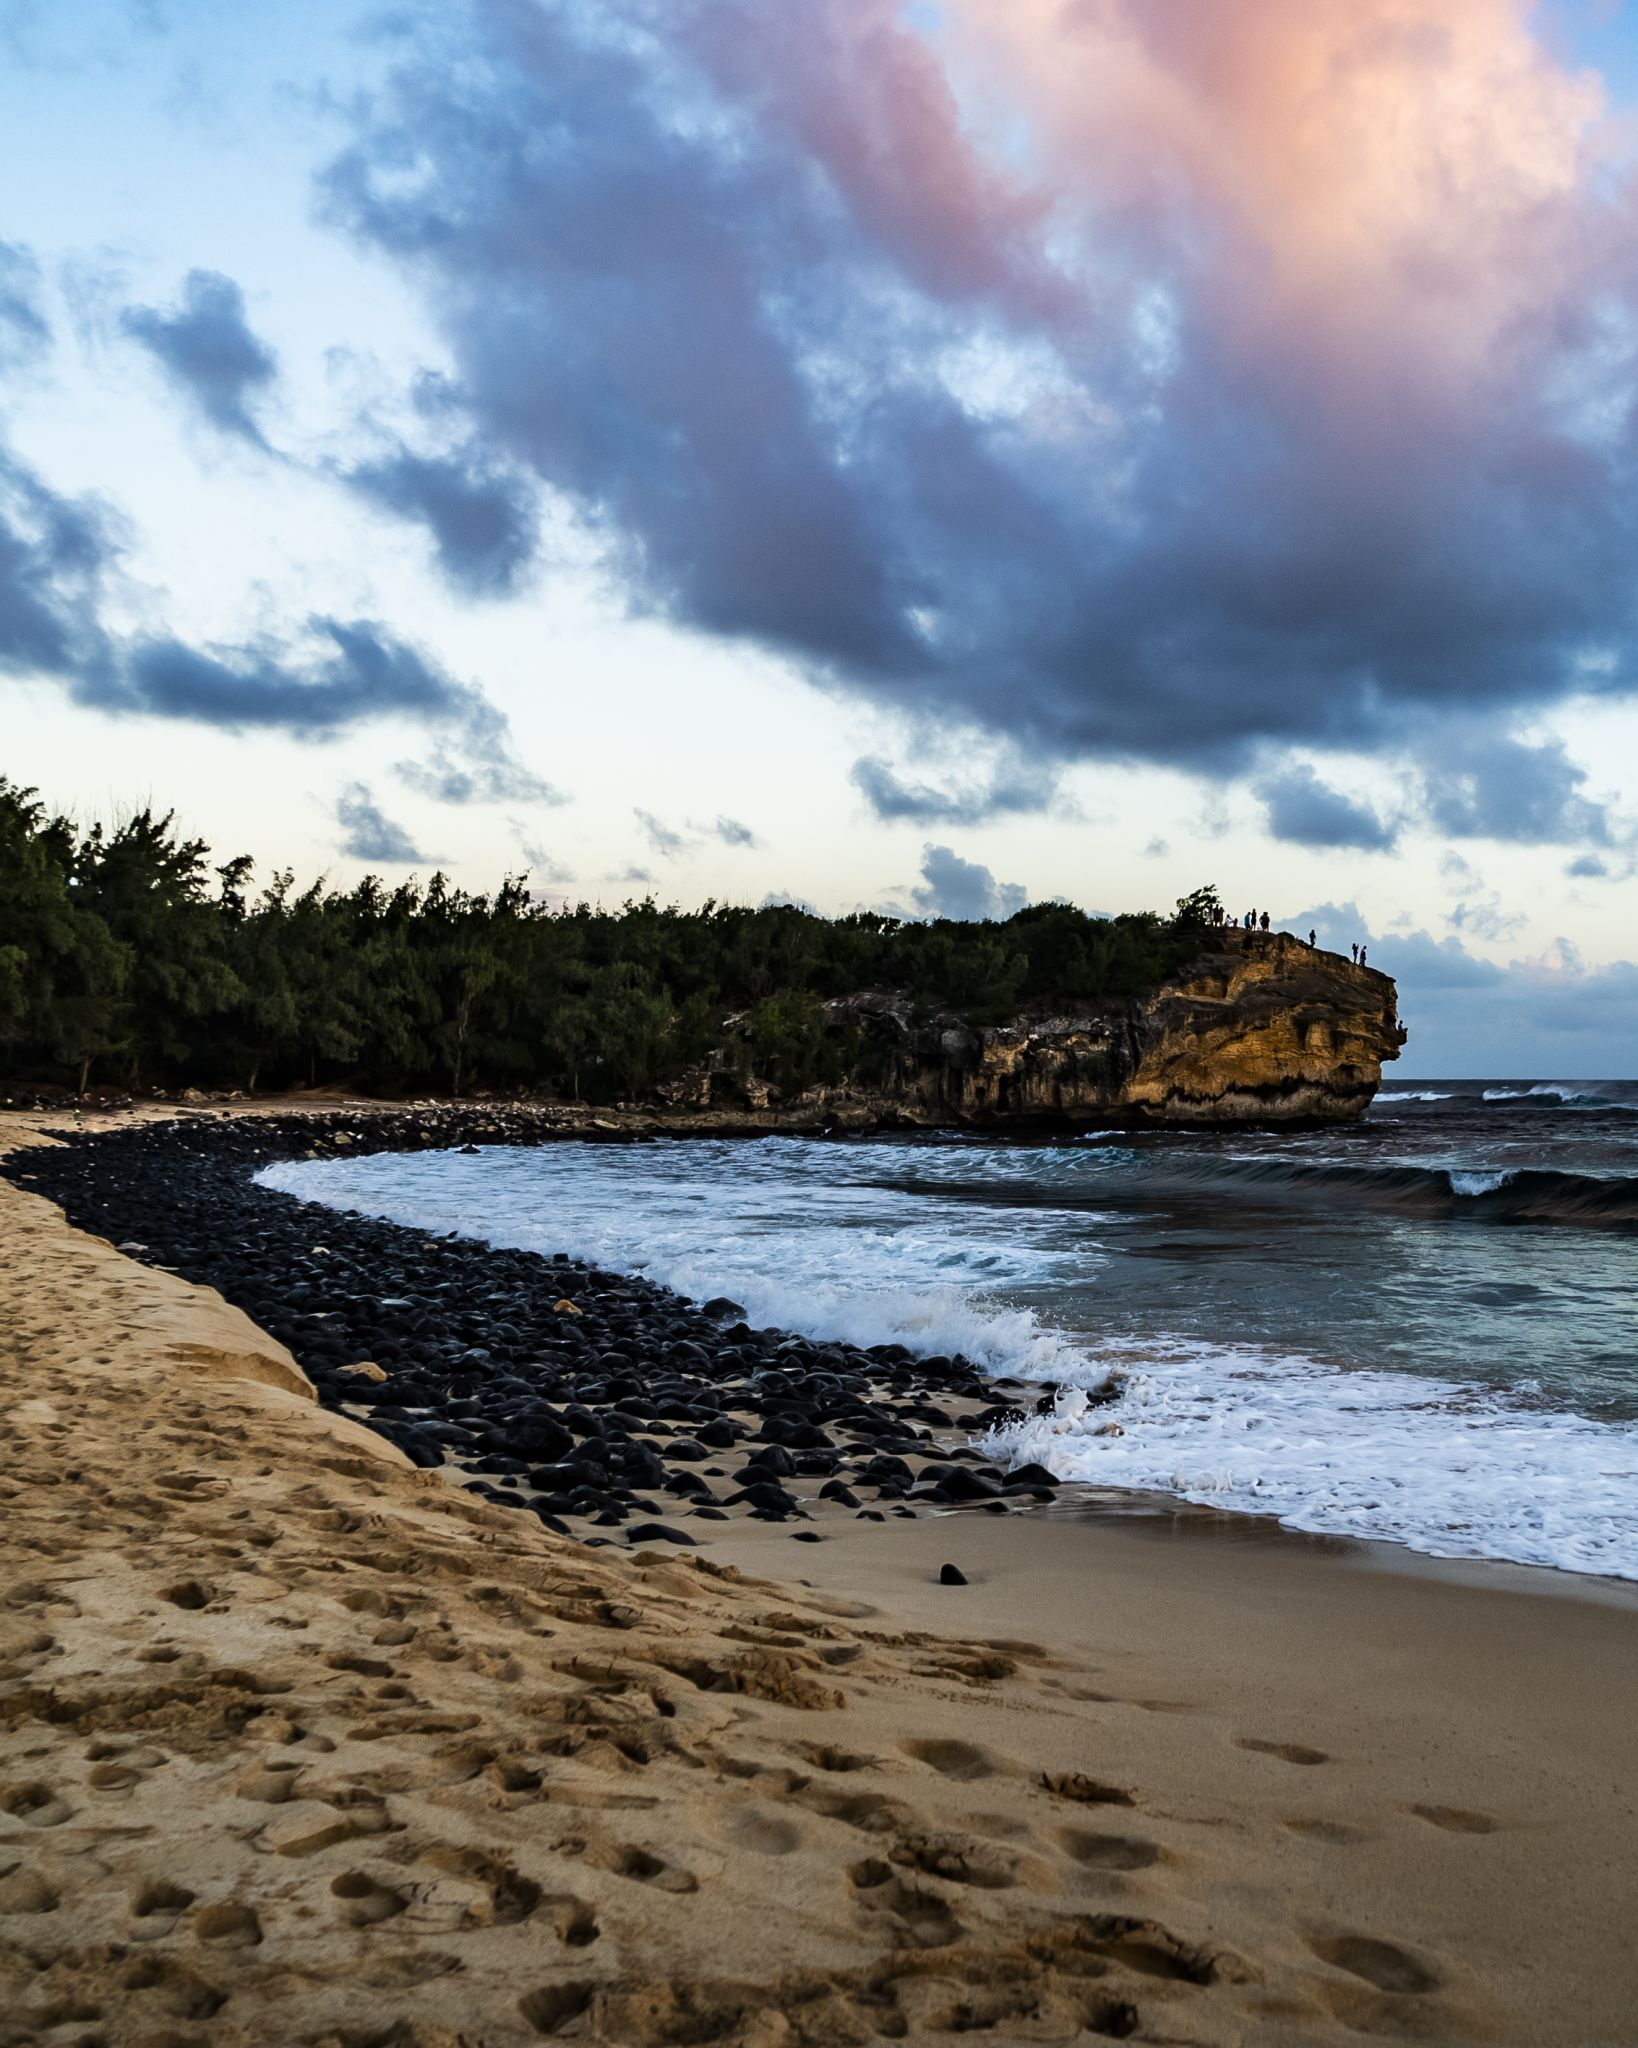 California man dies after jumping off cliff at popular Kauai